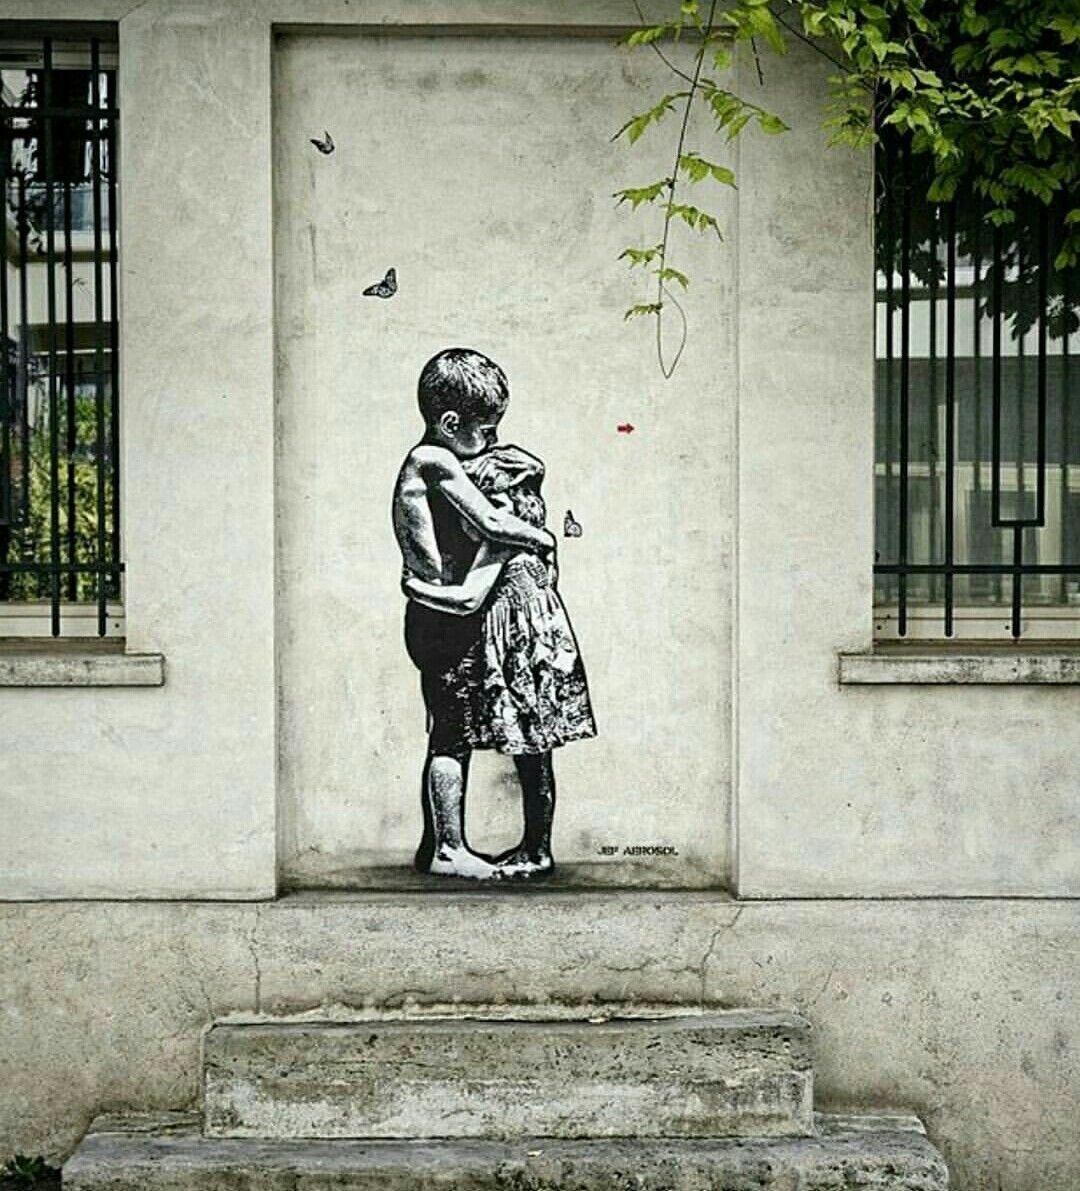 Jef aerosol street arts pinterest street art street and graffiti